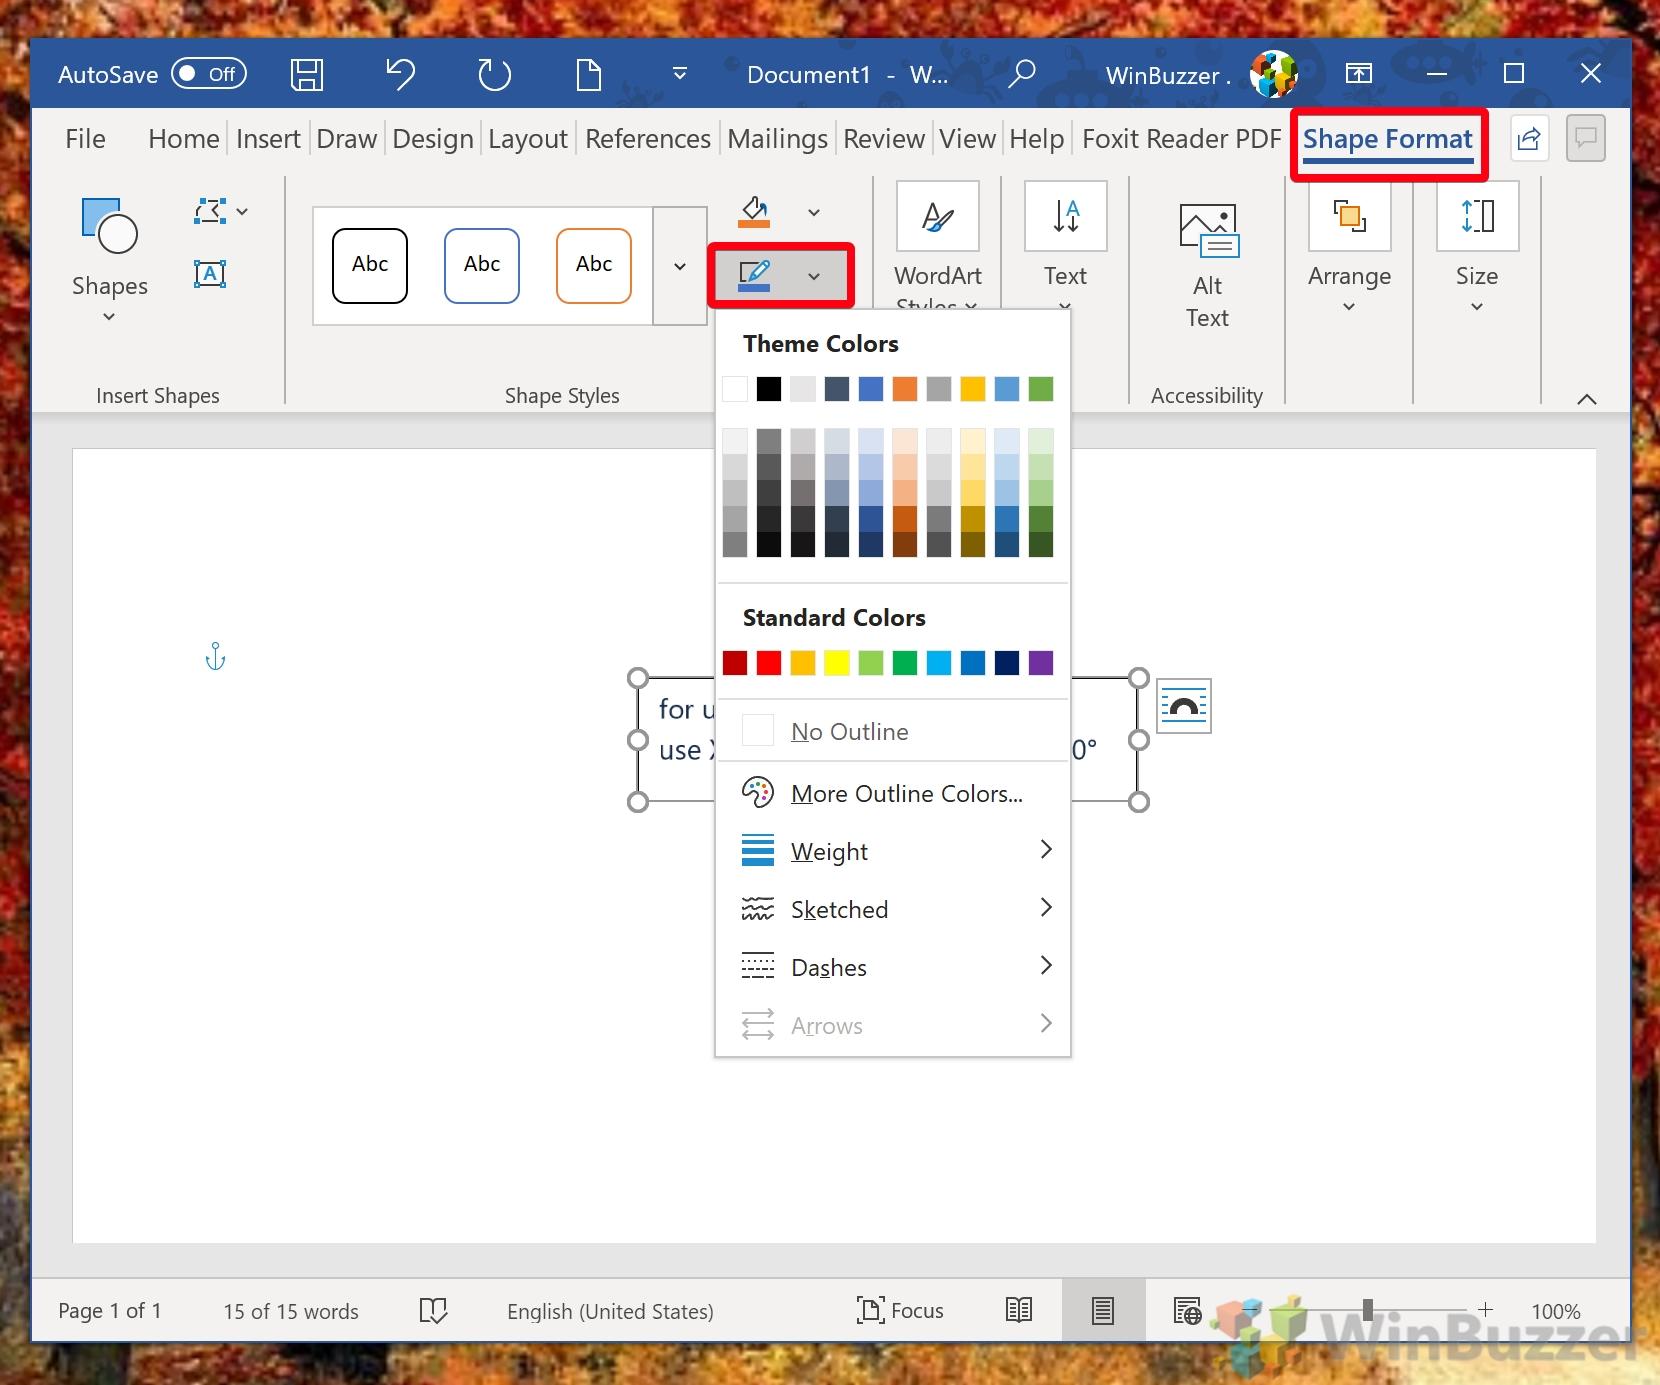 Windows 10 - Word - Shape Format - Shape Outline